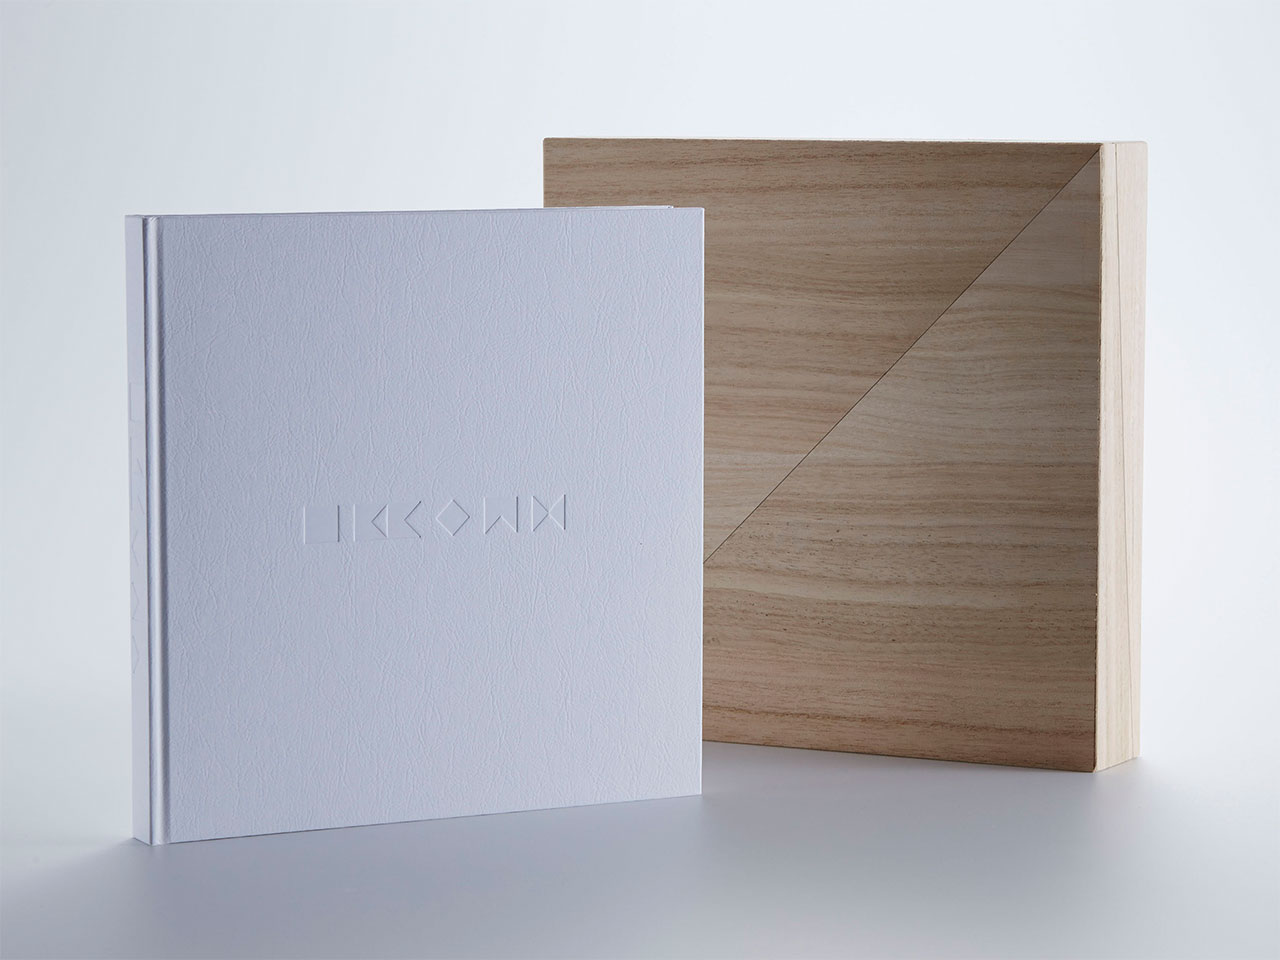 Cover and box of IKKOAN book. Creative Director, Editor: Ryusuke Nanki. Art Director: Kazunori Kawagoshi. Photographer: Makoto Horiuchi. Design: Hiromi Irisawa.